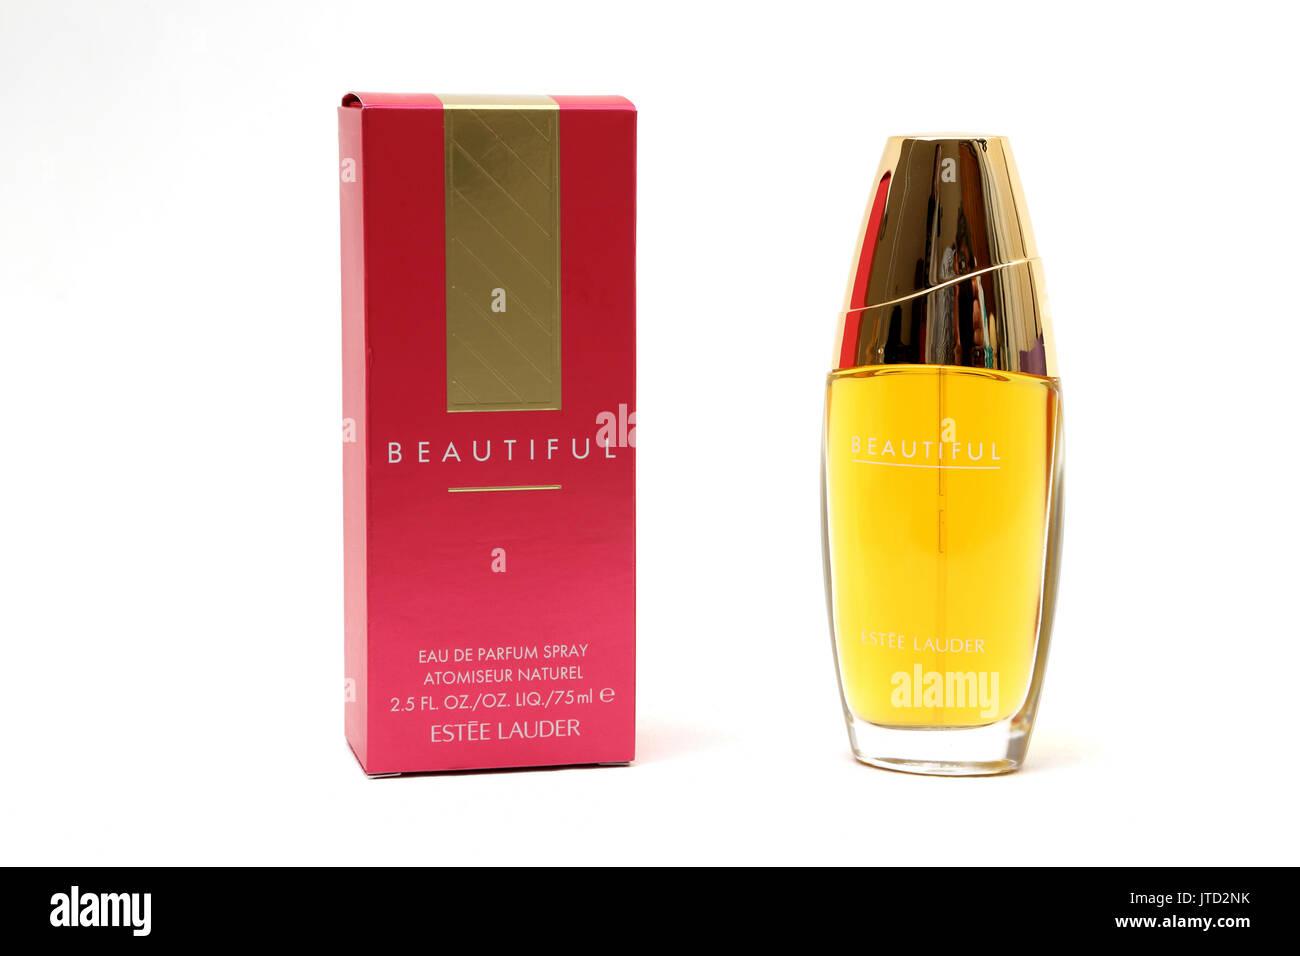 Estee Lauder Stock Photos Images Alamy Beautiful Women 75ml Eau De Parfum Spray Image